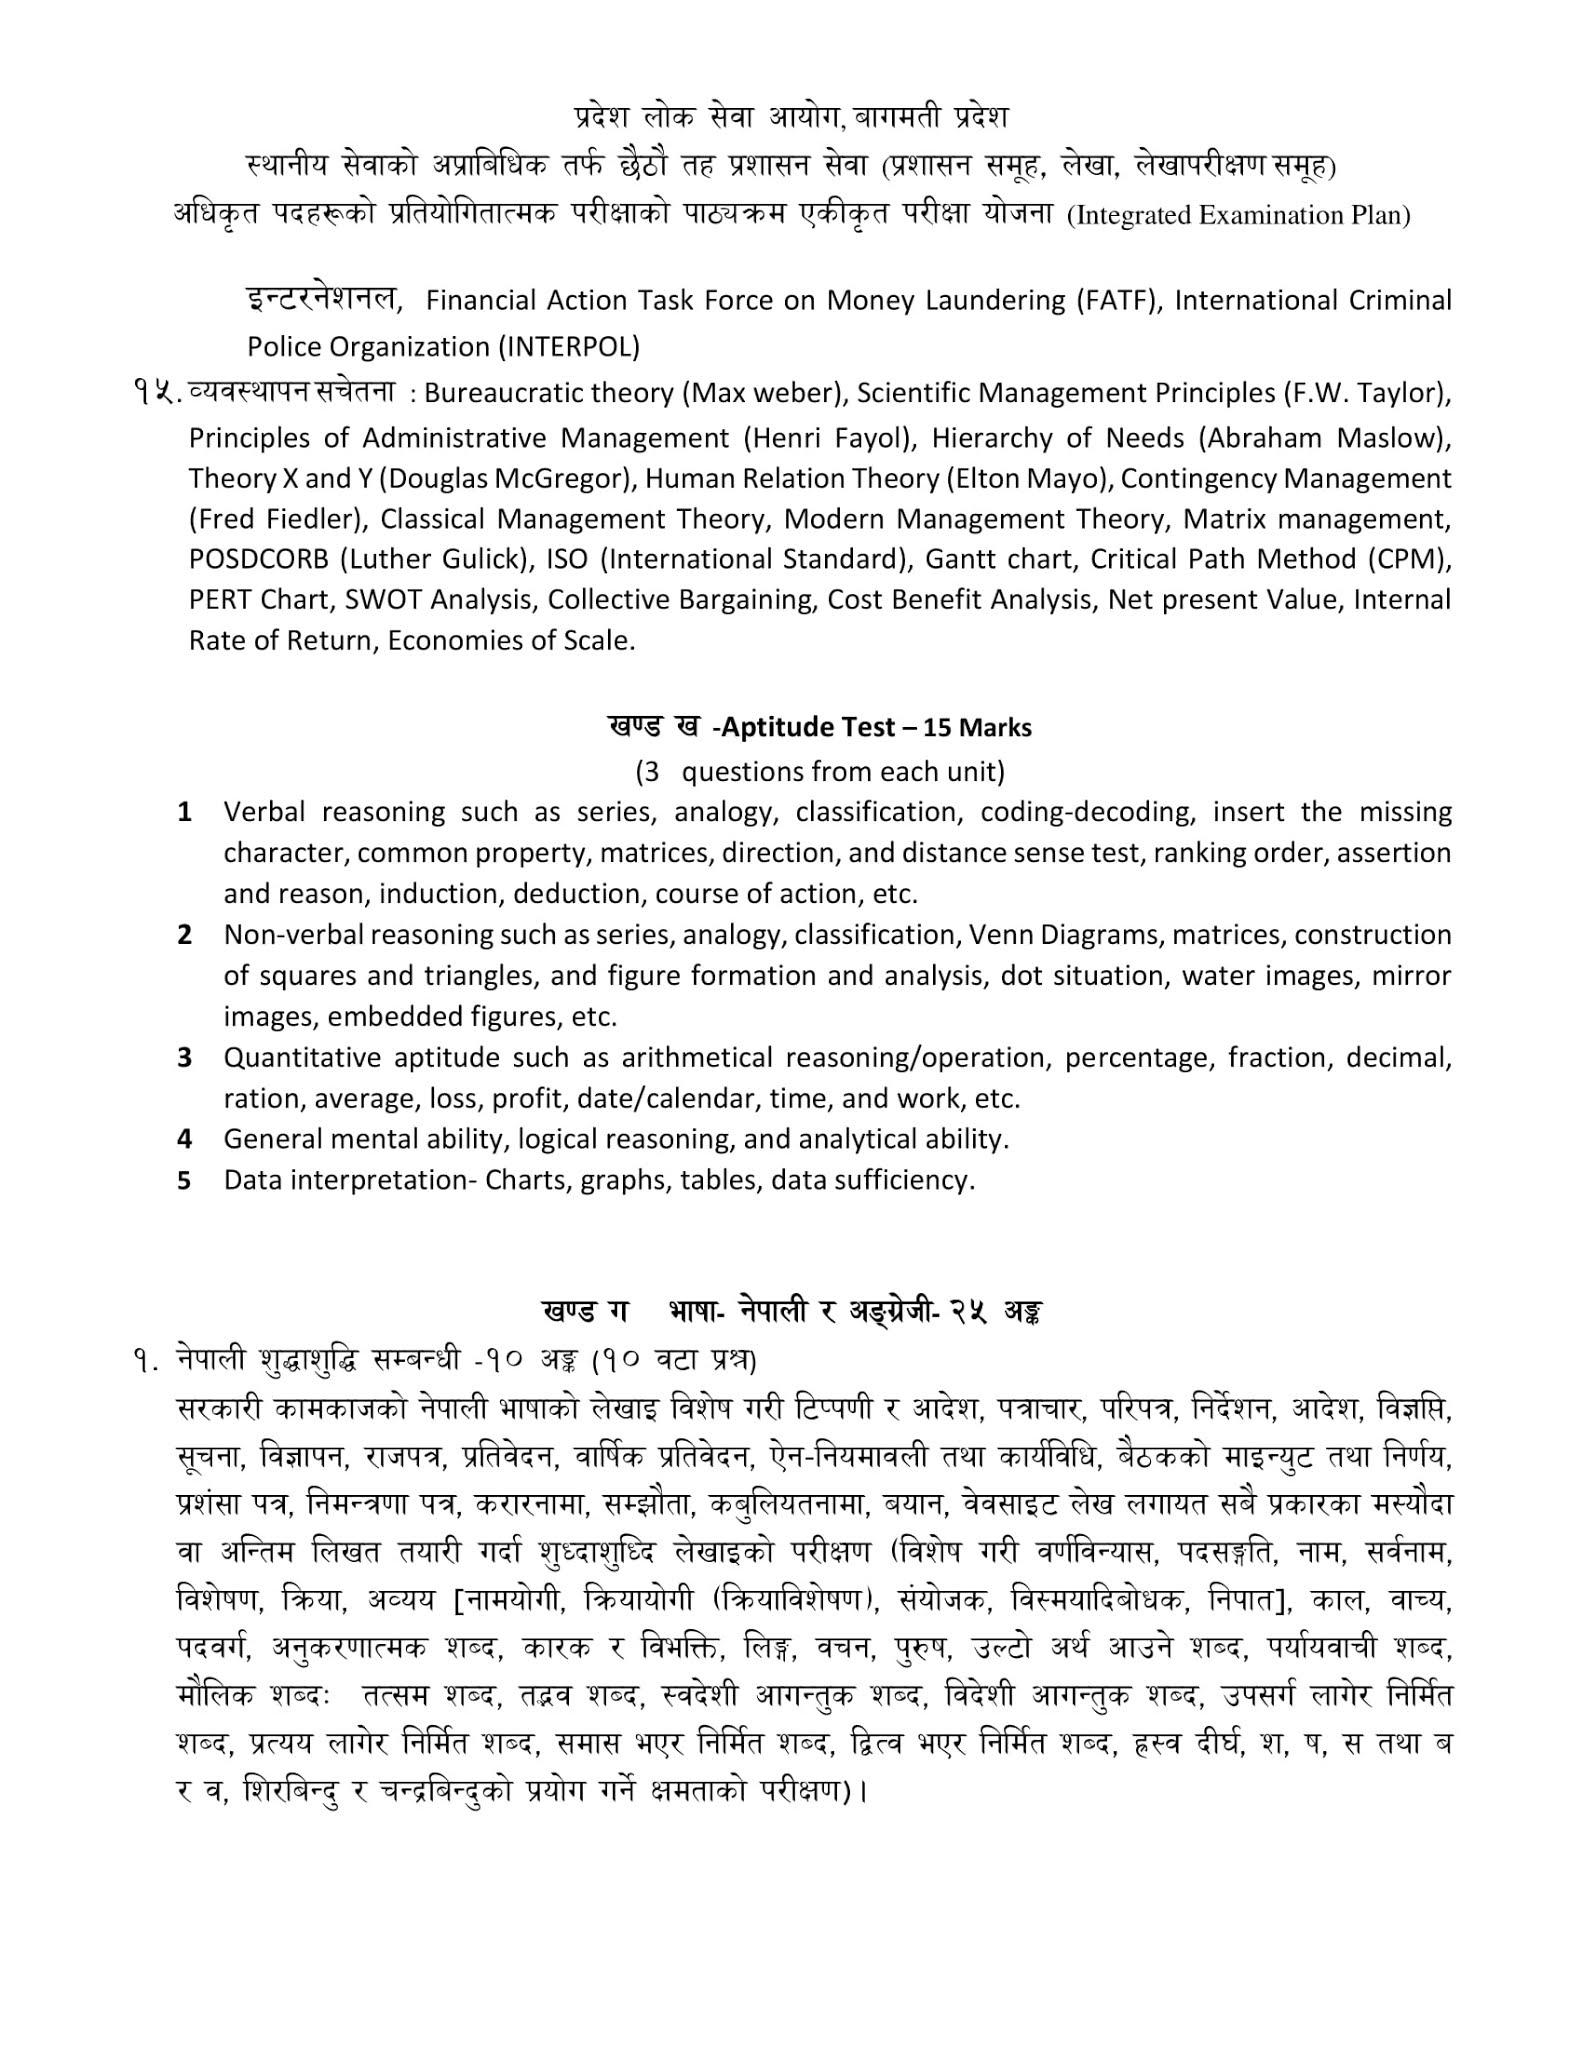 Bagmati Pradesh Officer 6th Level Non Technical Syllables For Local Level - बागमती प्रदेश स्थानीय सेवाको अप्राविधिक छैटौं तहको पाठ्यक्रम